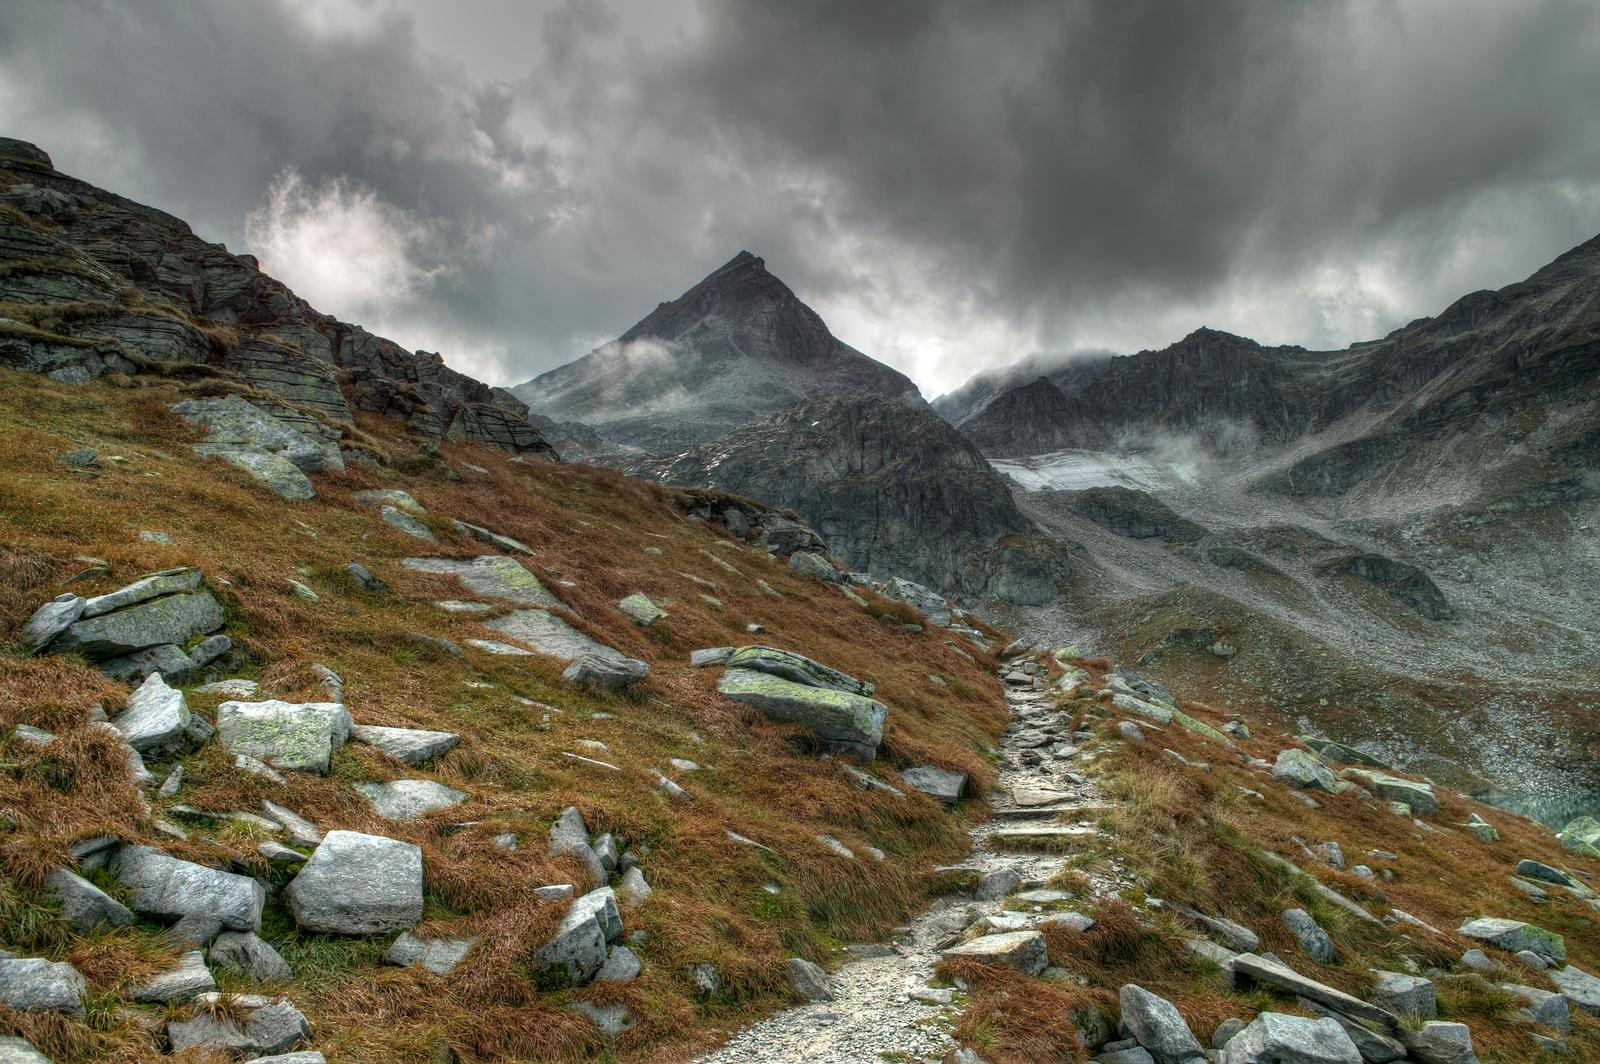 Mountain Trail by Burtn on DeviantArt